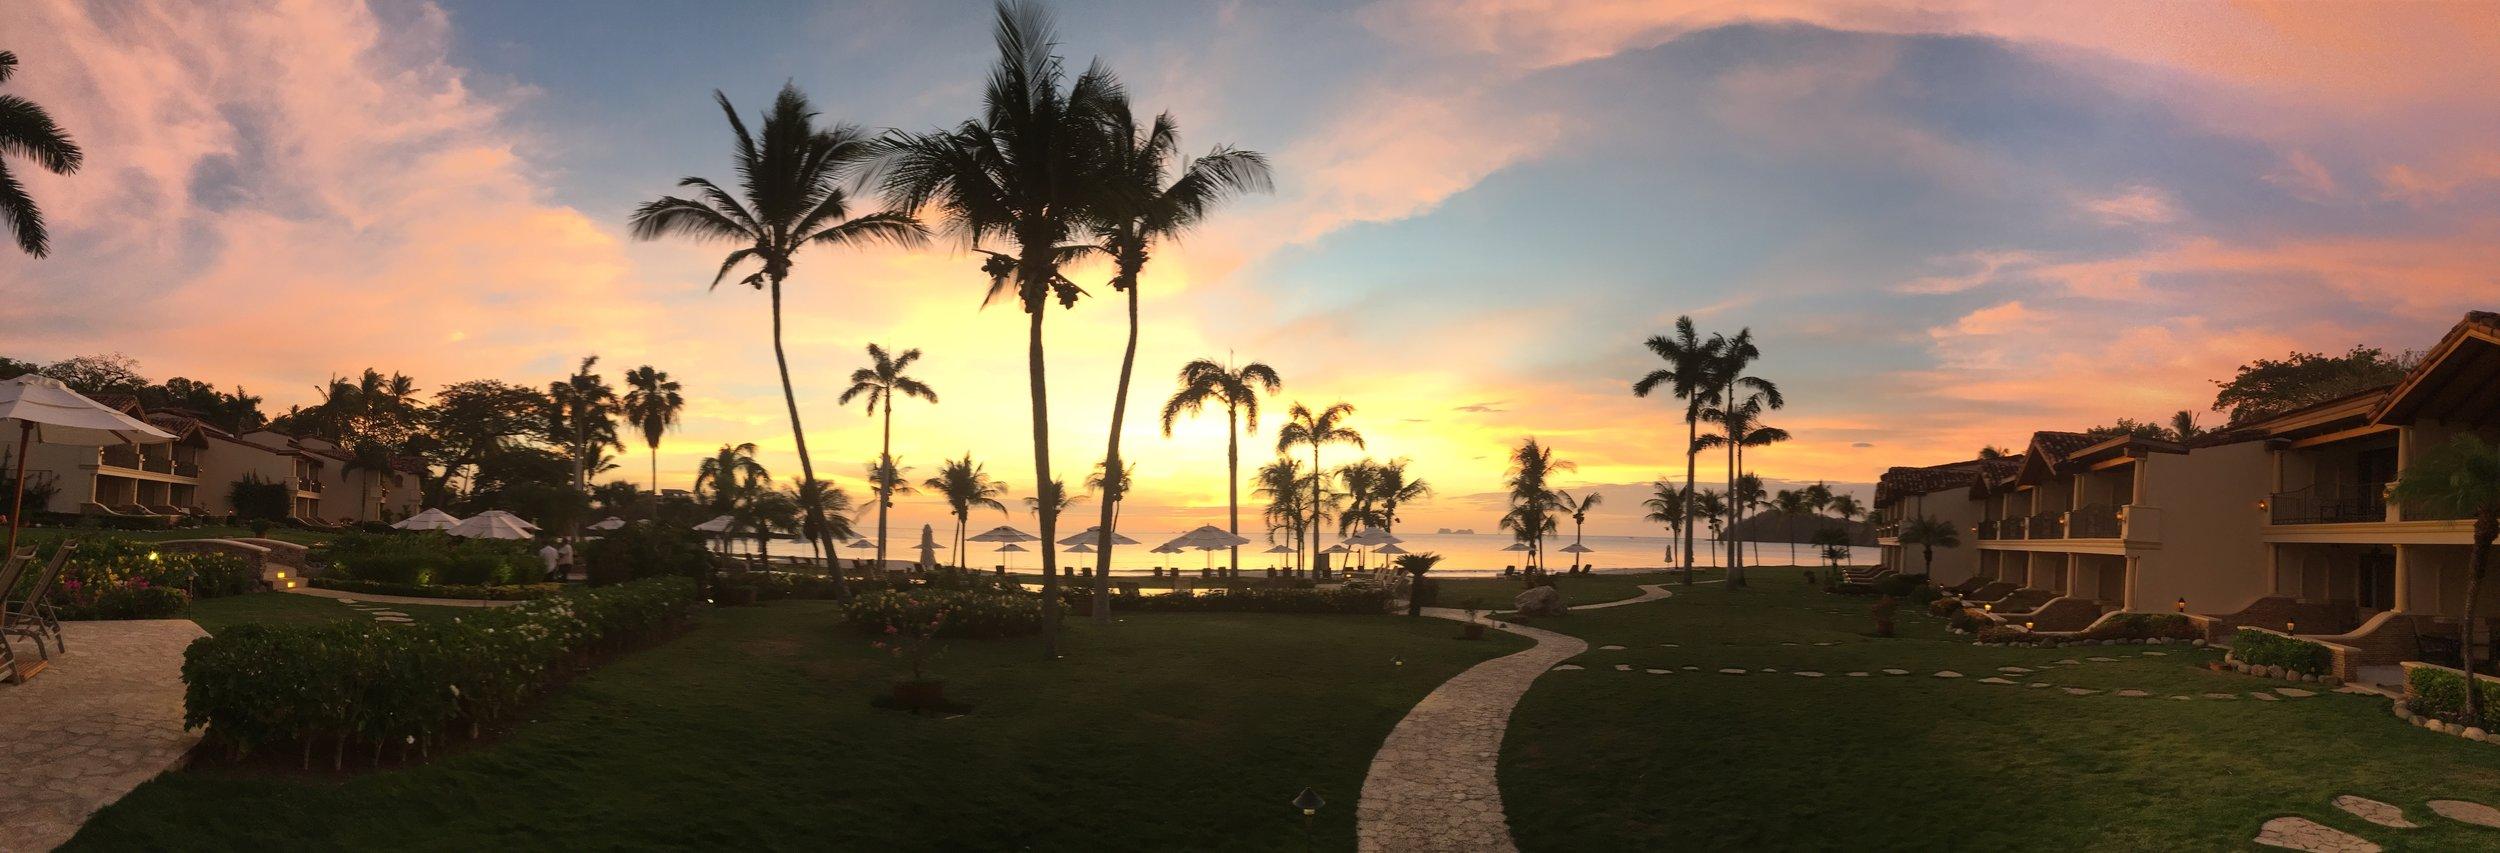 The Palms CR Sunset.JPG